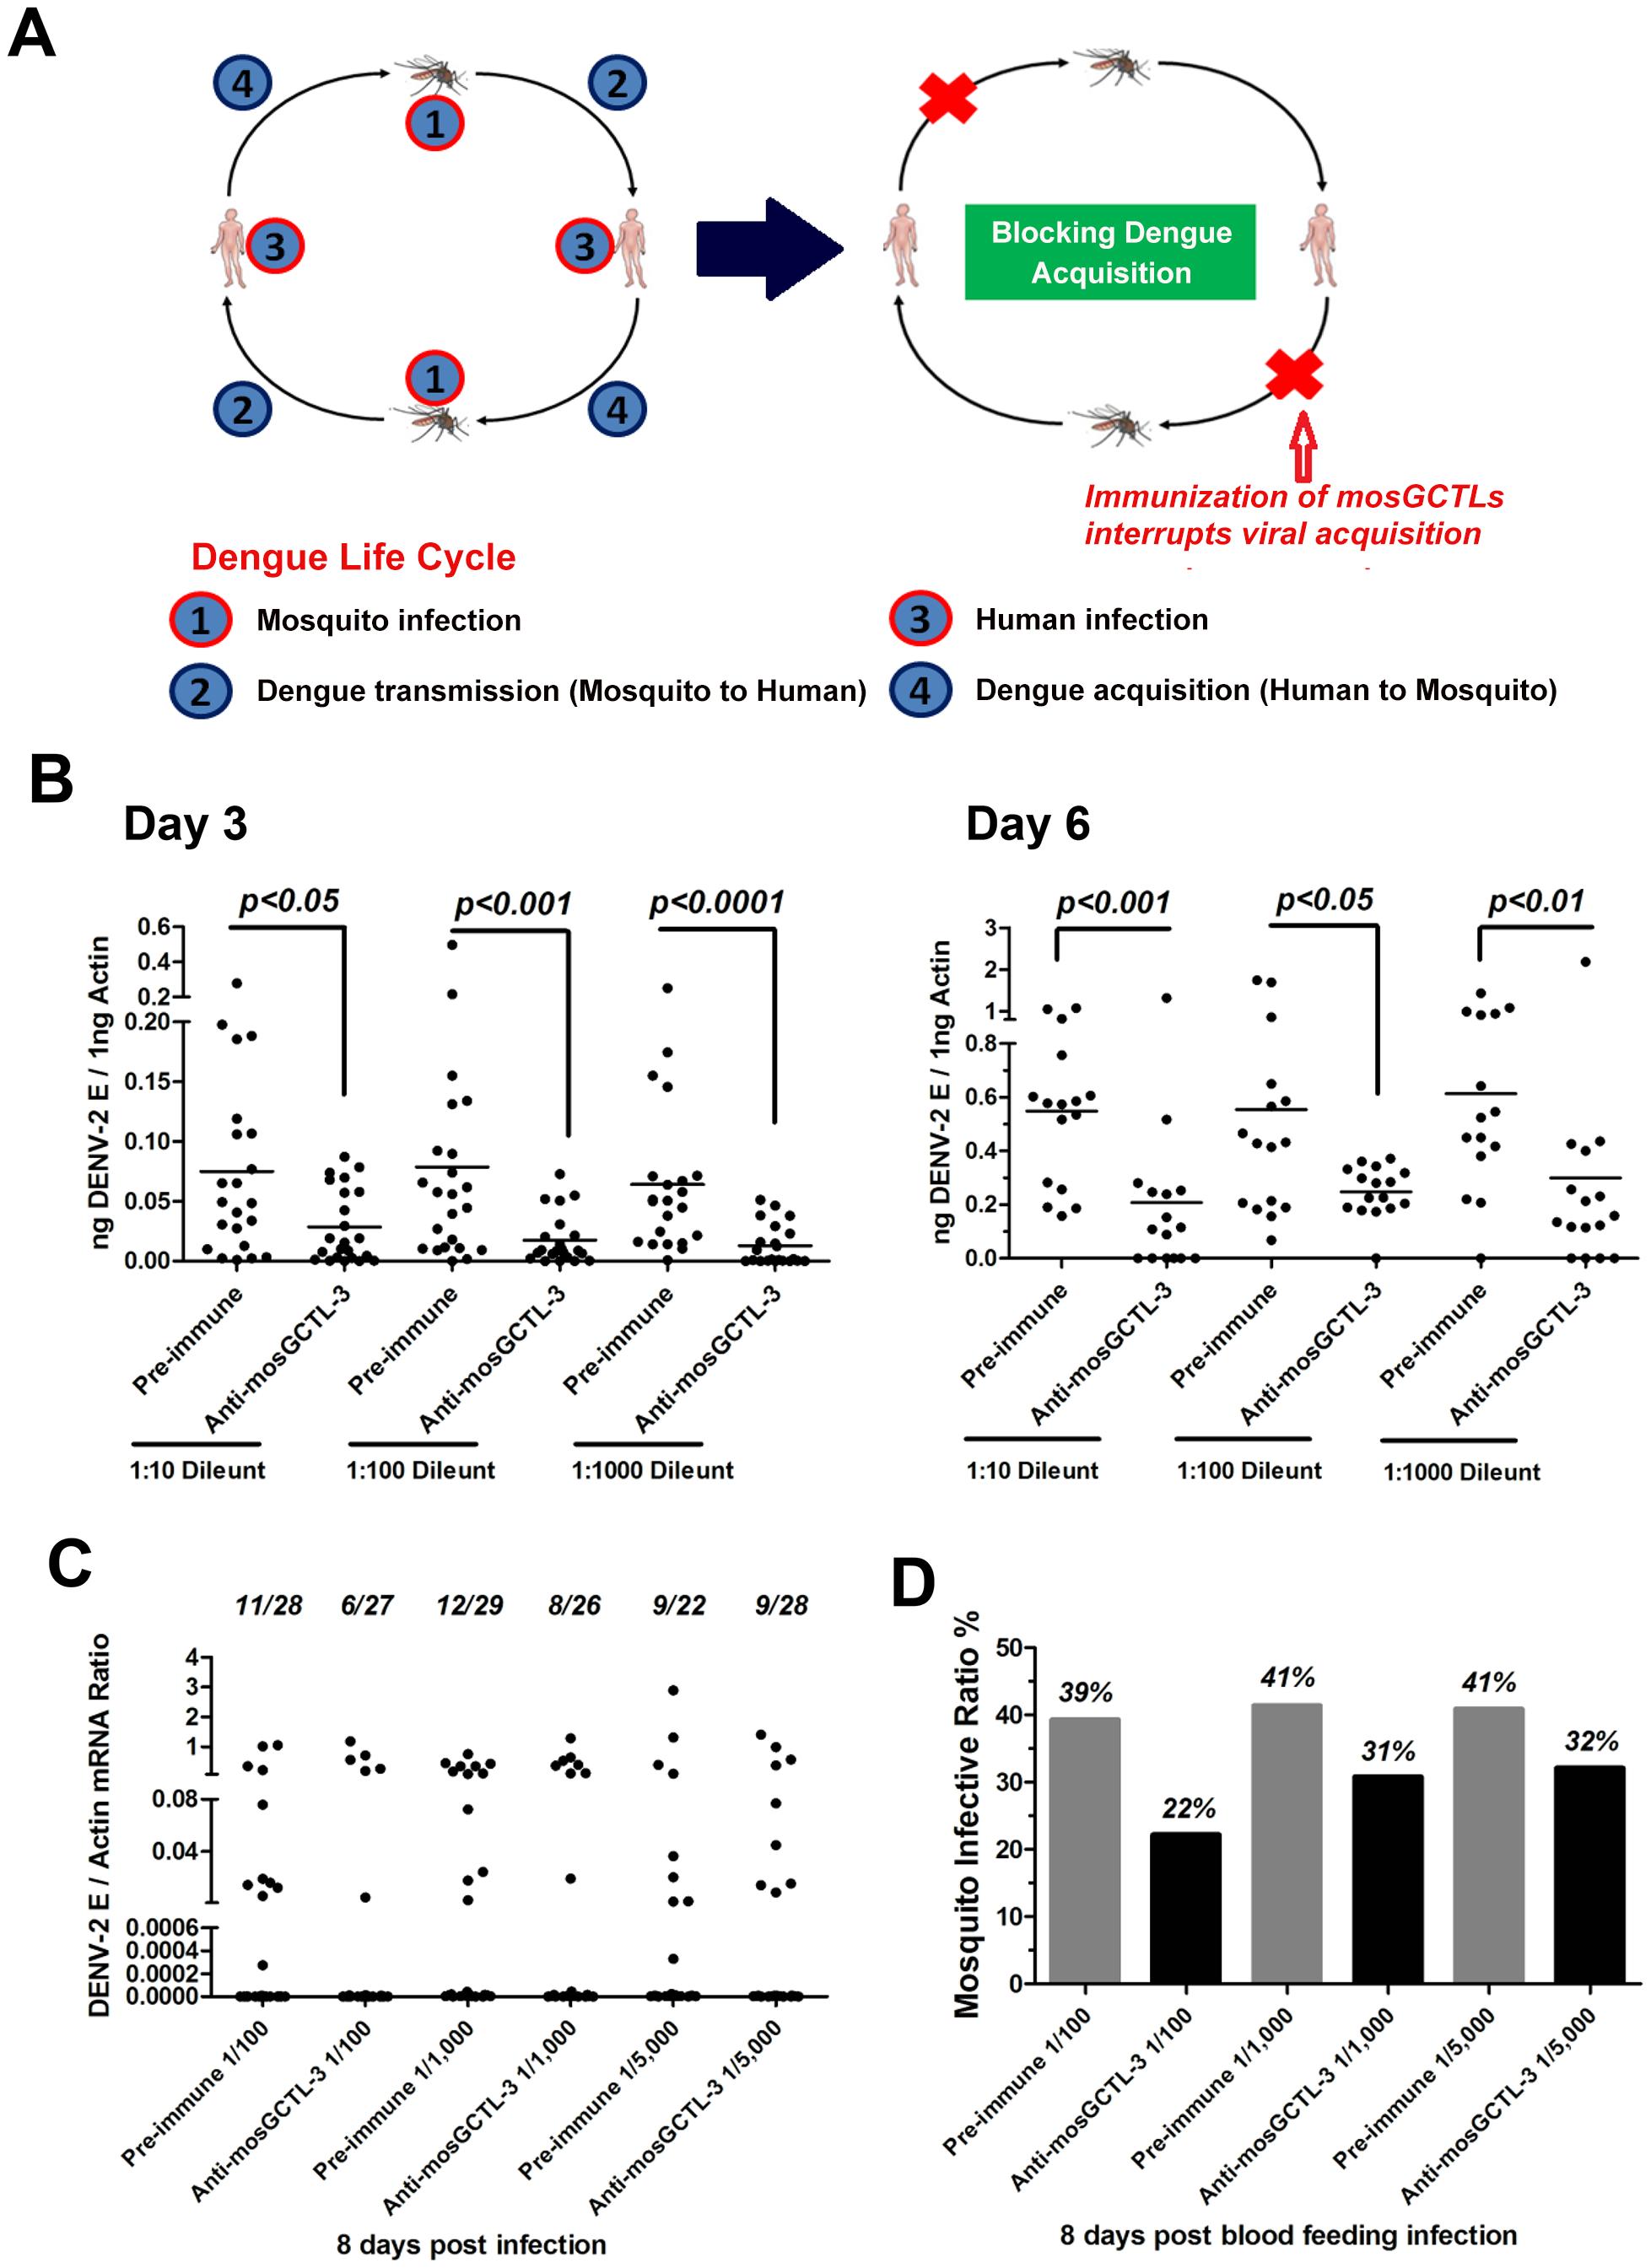 mosGCTL-3 antisera interrupted DENV-2 infection of <i>A. aegypti</i>.